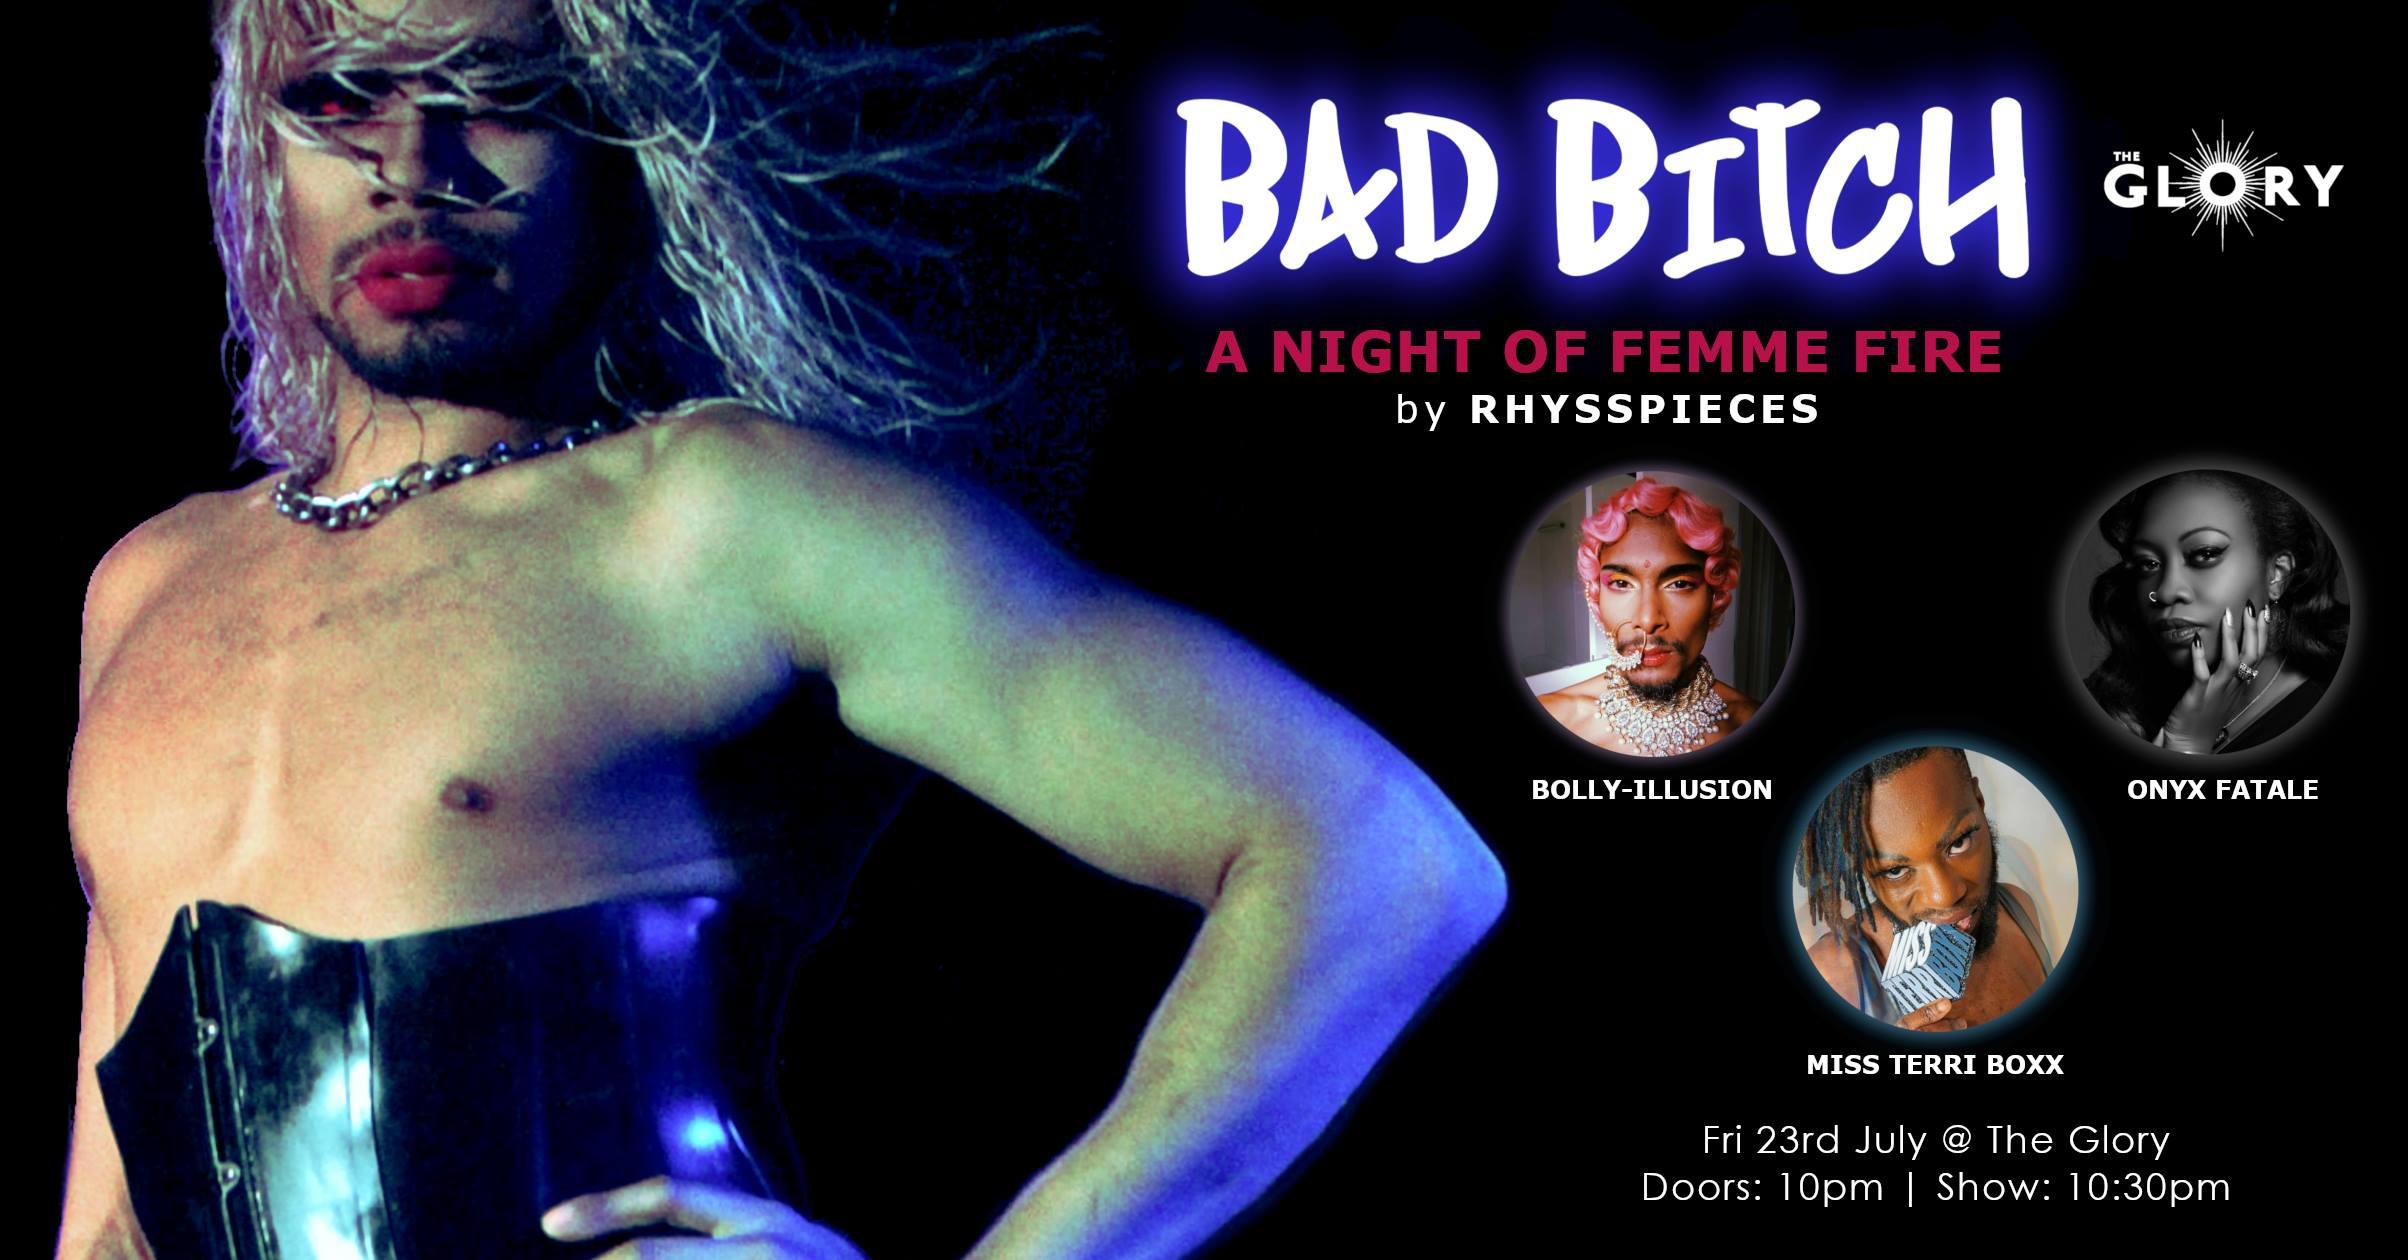 Bad Bitch – A Night of Femme Fire